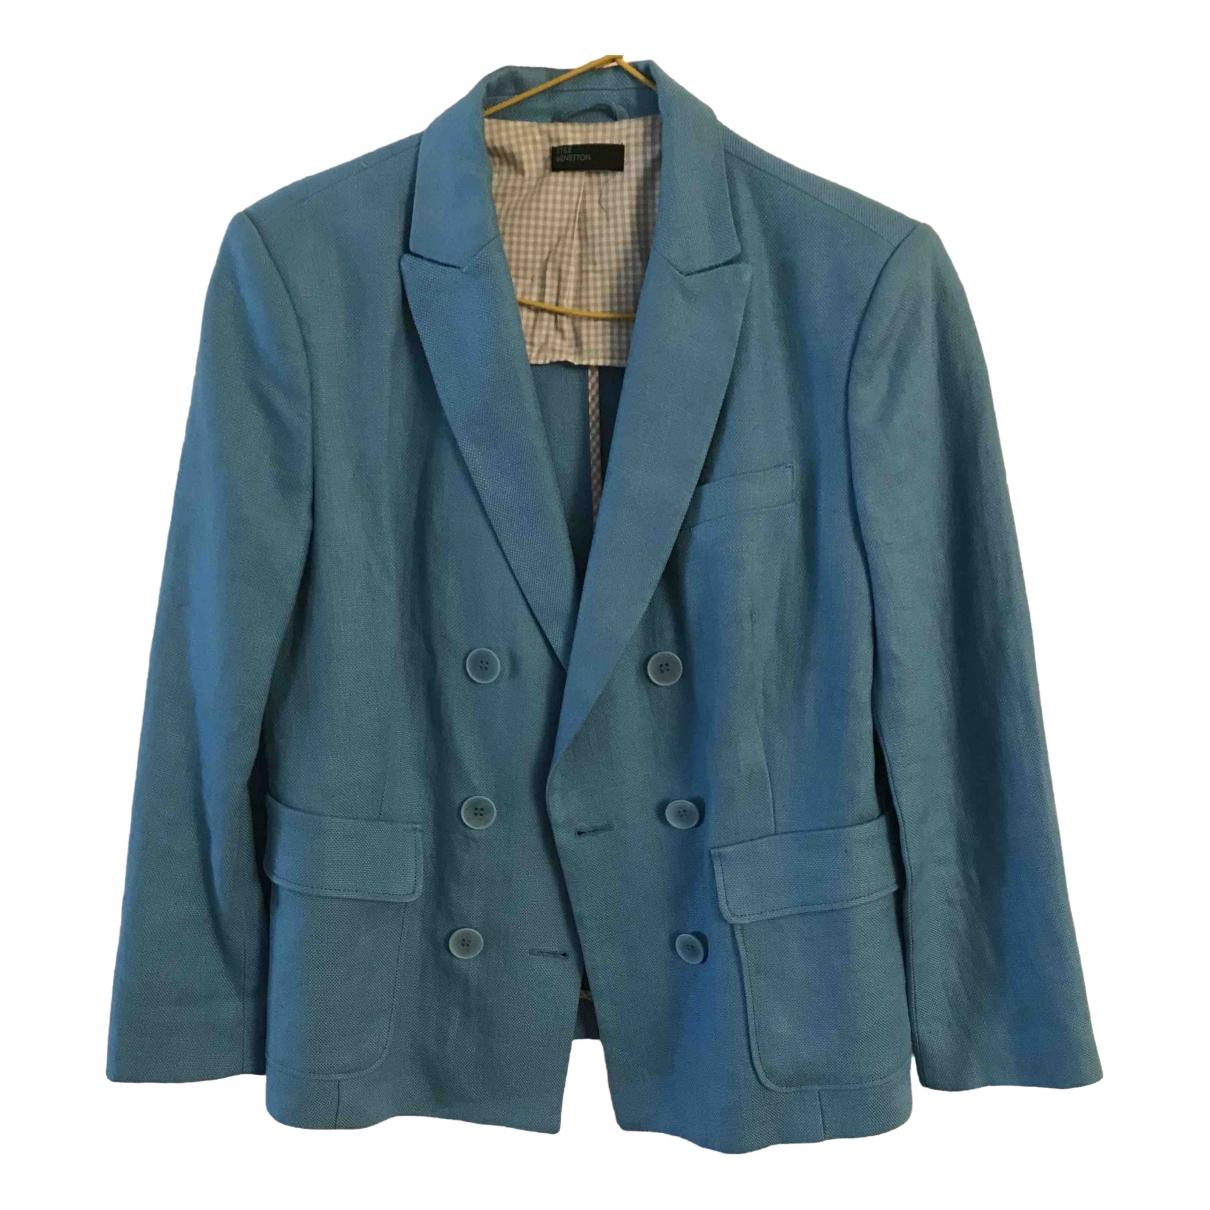 Benetton - Veste   pour femme en lin - bleu